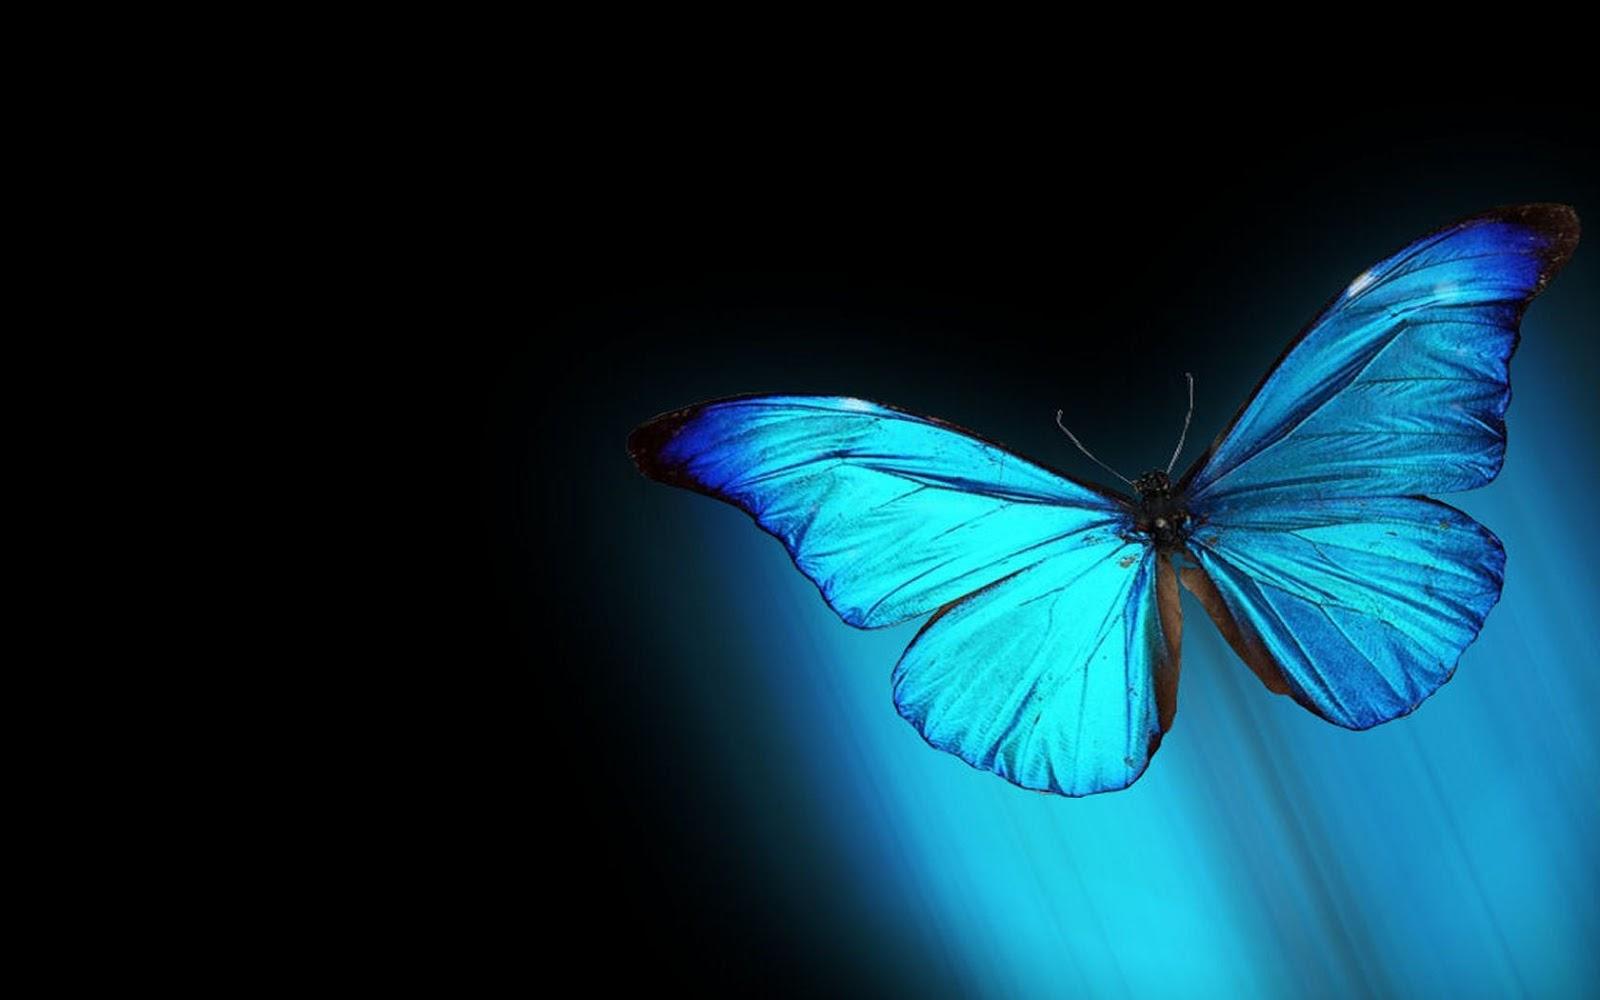 Cute Butterflies Hd Wallpapers En G 252 Zel Full Hd Kelebek Duvar Kağıtları Sekizbir